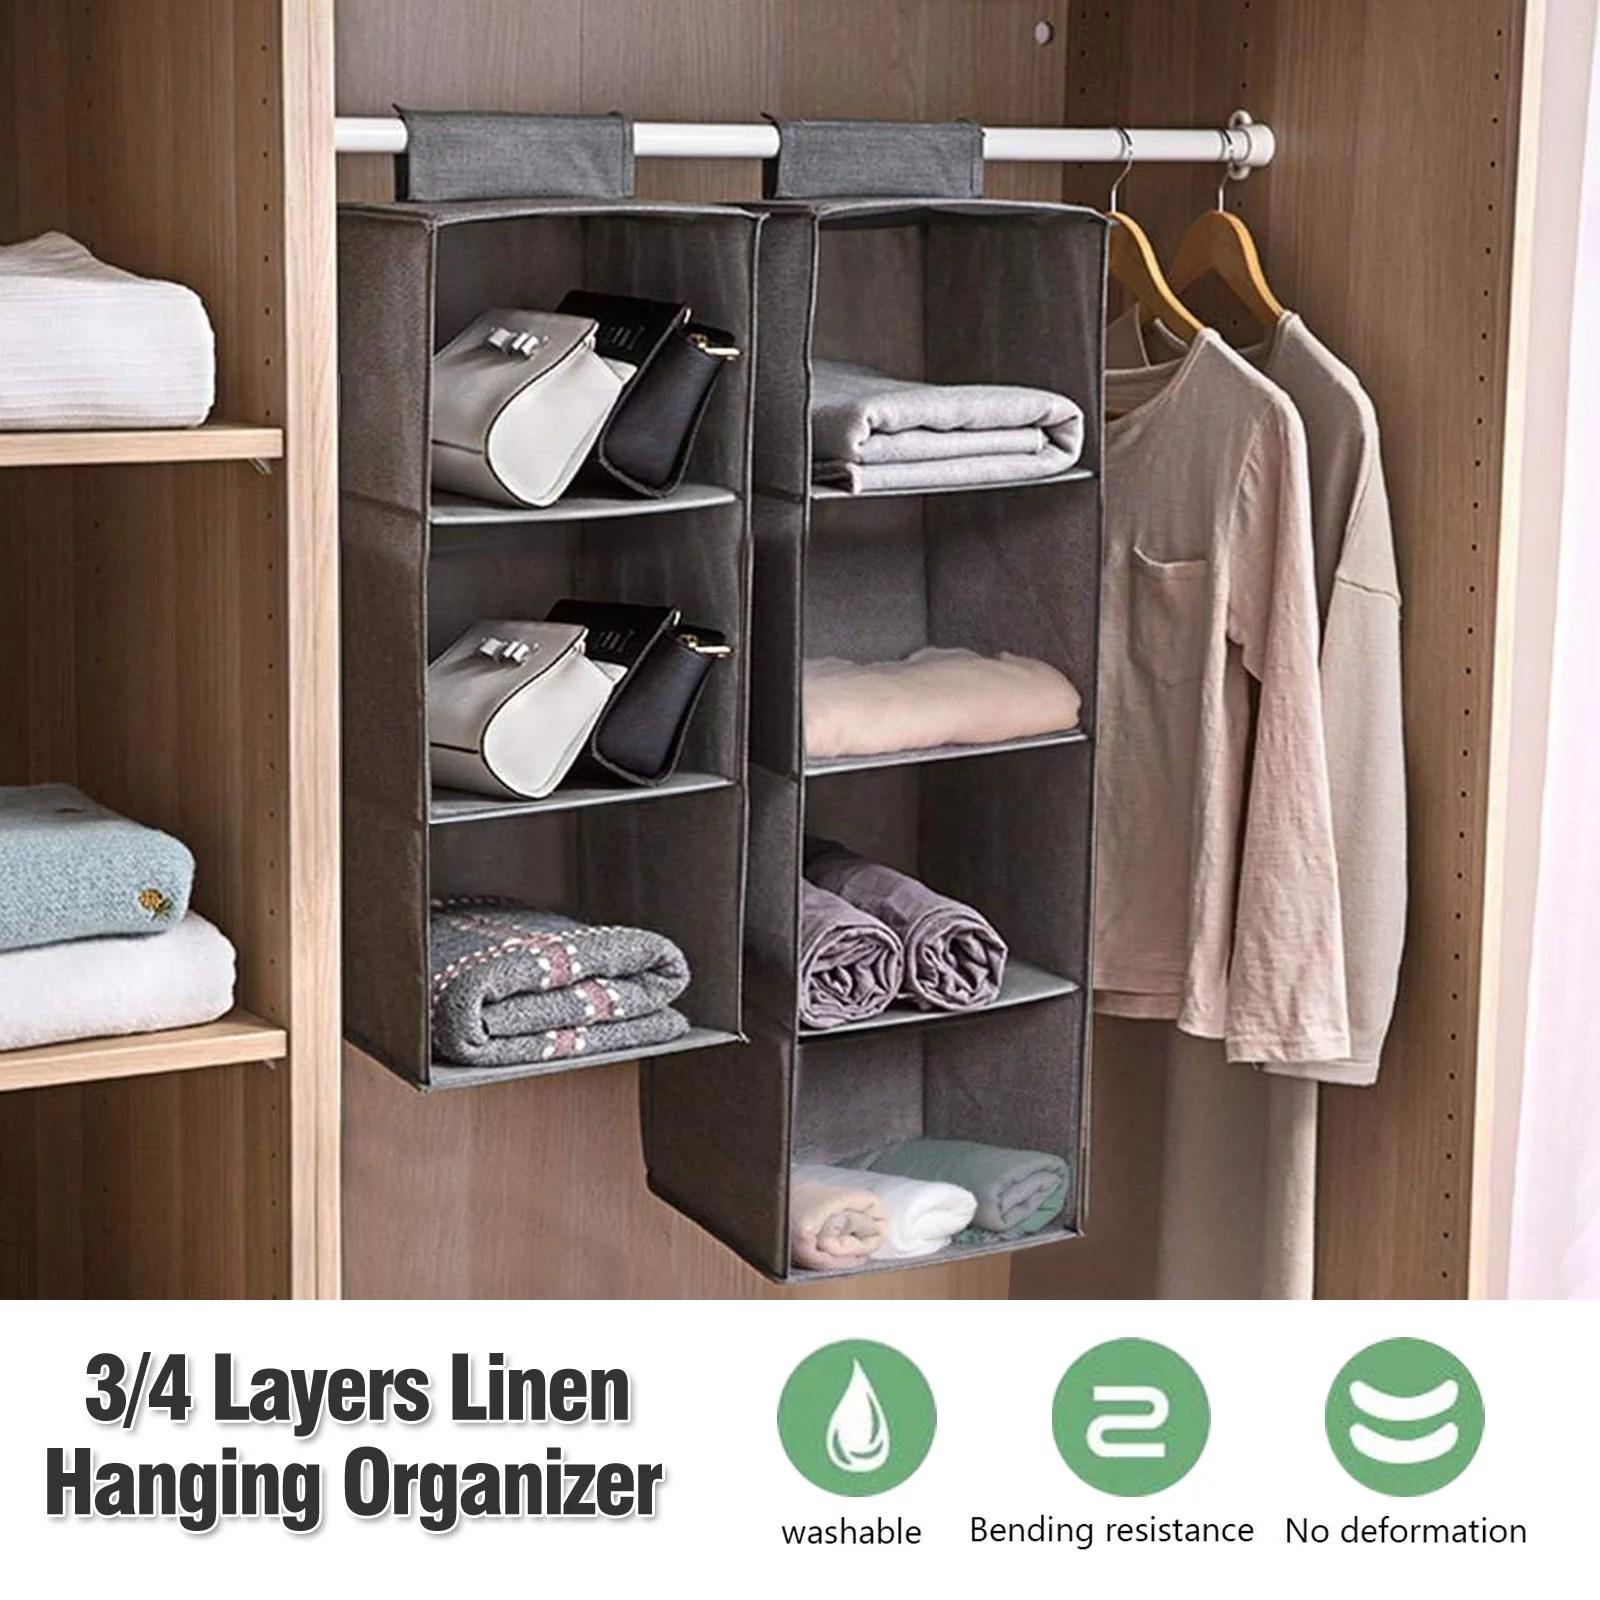 3-Shelf Foldable Hanging Closet Organizers Space Saver ... on Closet Space Savers Walmart  id=28869